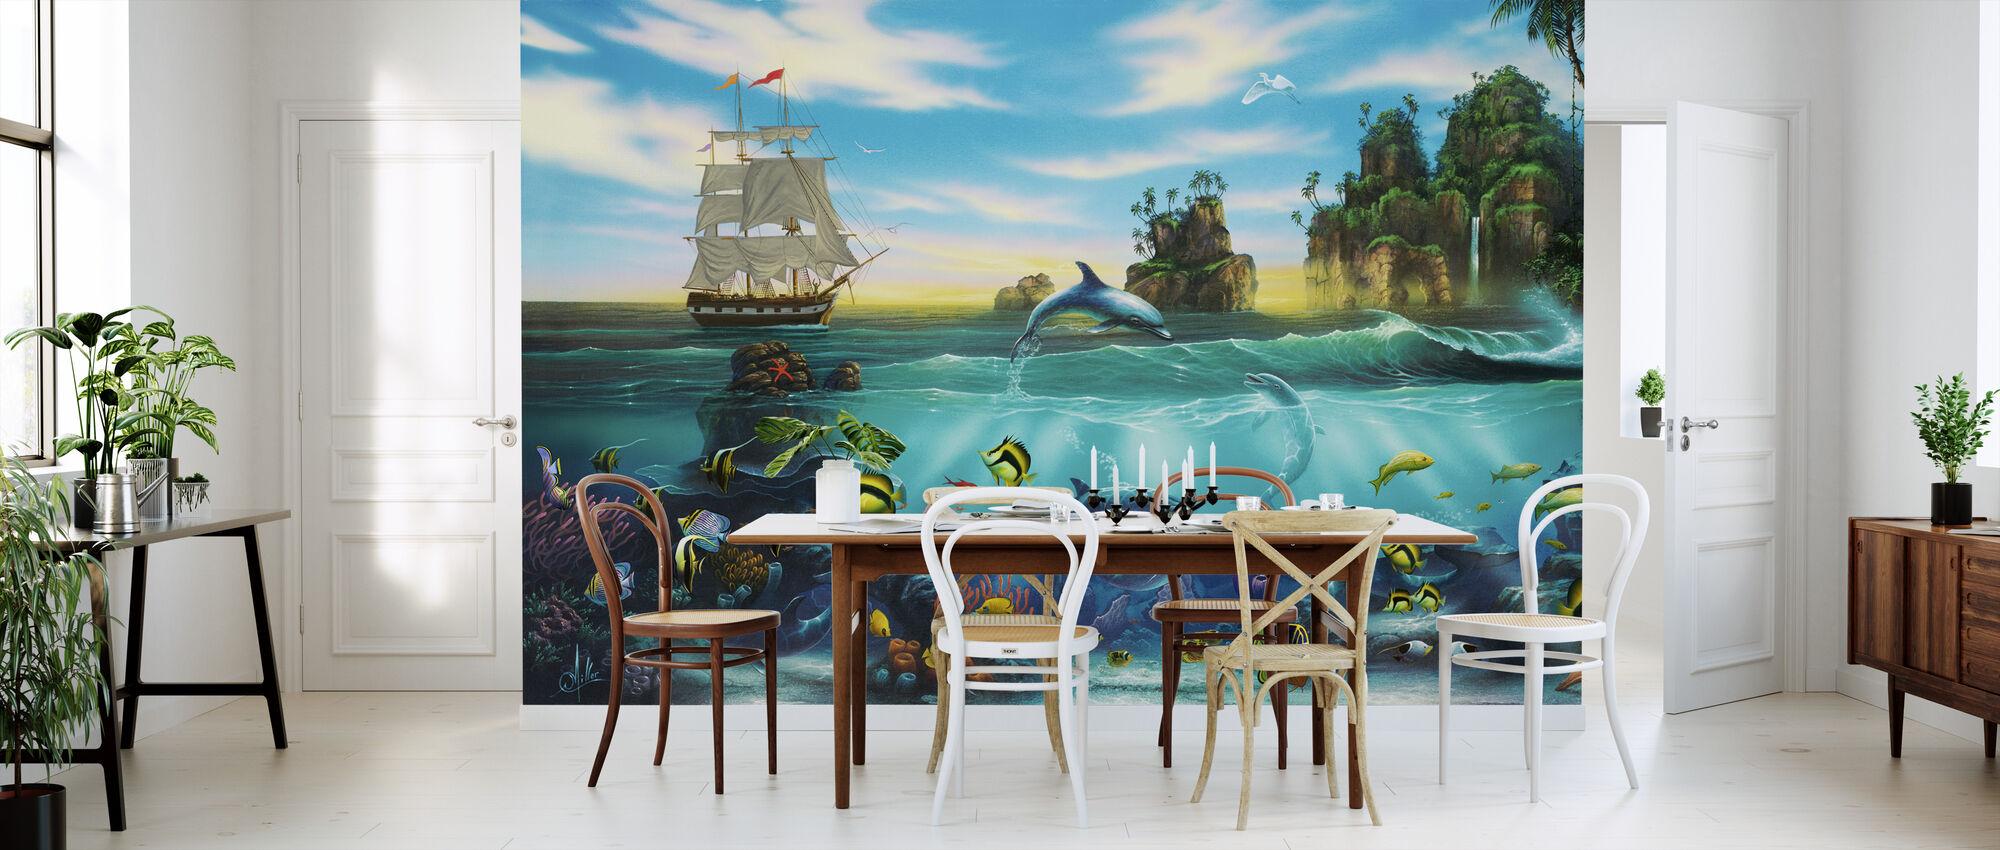 paradise found fototapete nach ma photowall. Black Bedroom Furniture Sets. Home Design Ideas